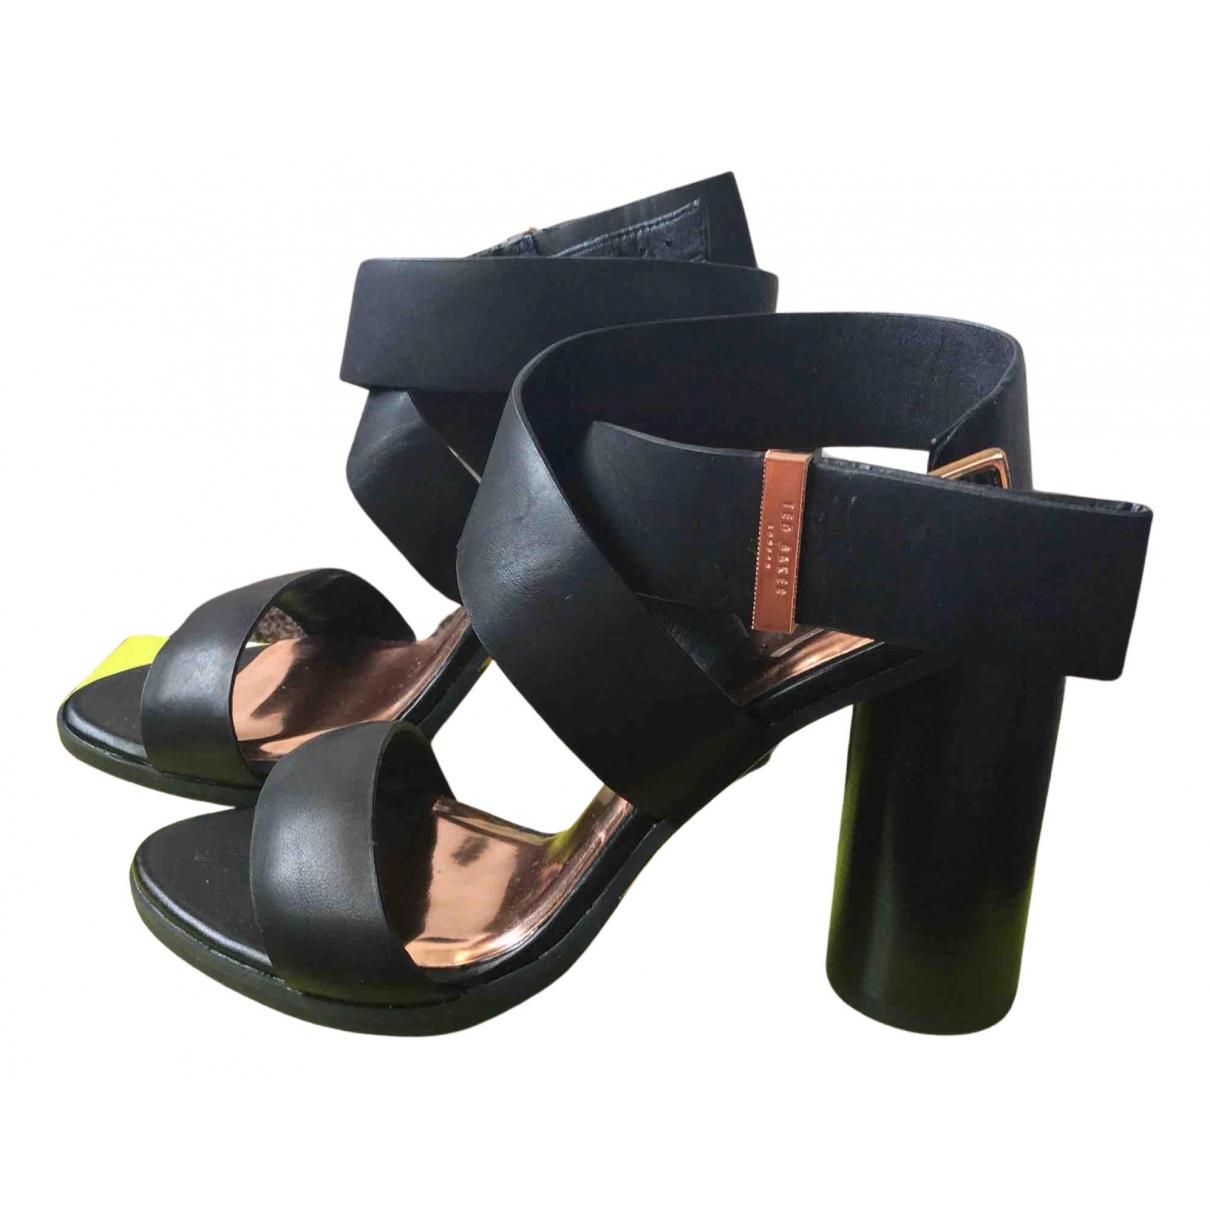 Ted Baker N Black Leather Sandals for Women 4 UK